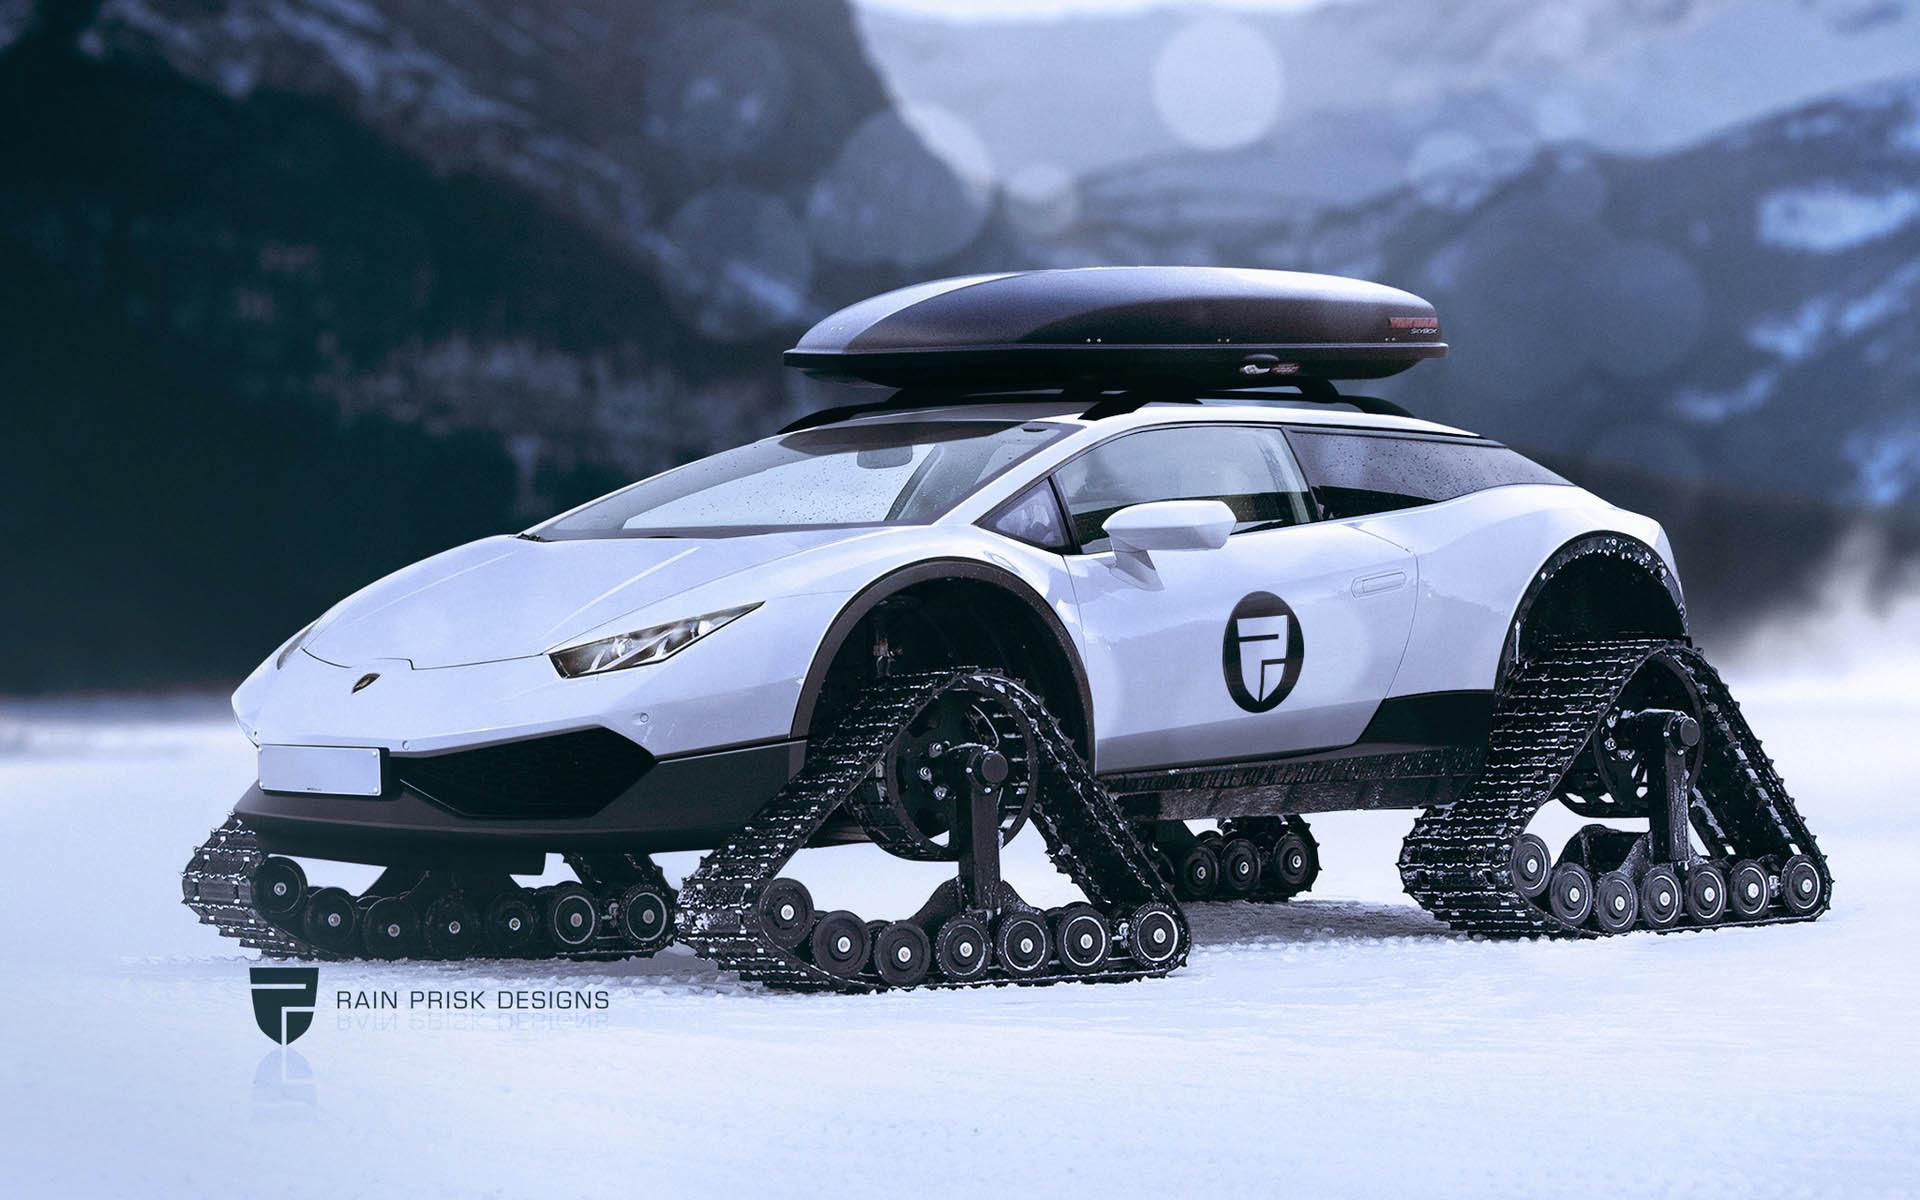 Lamborghini Huracán Snowmobile: Snomo Lambo - Technabob